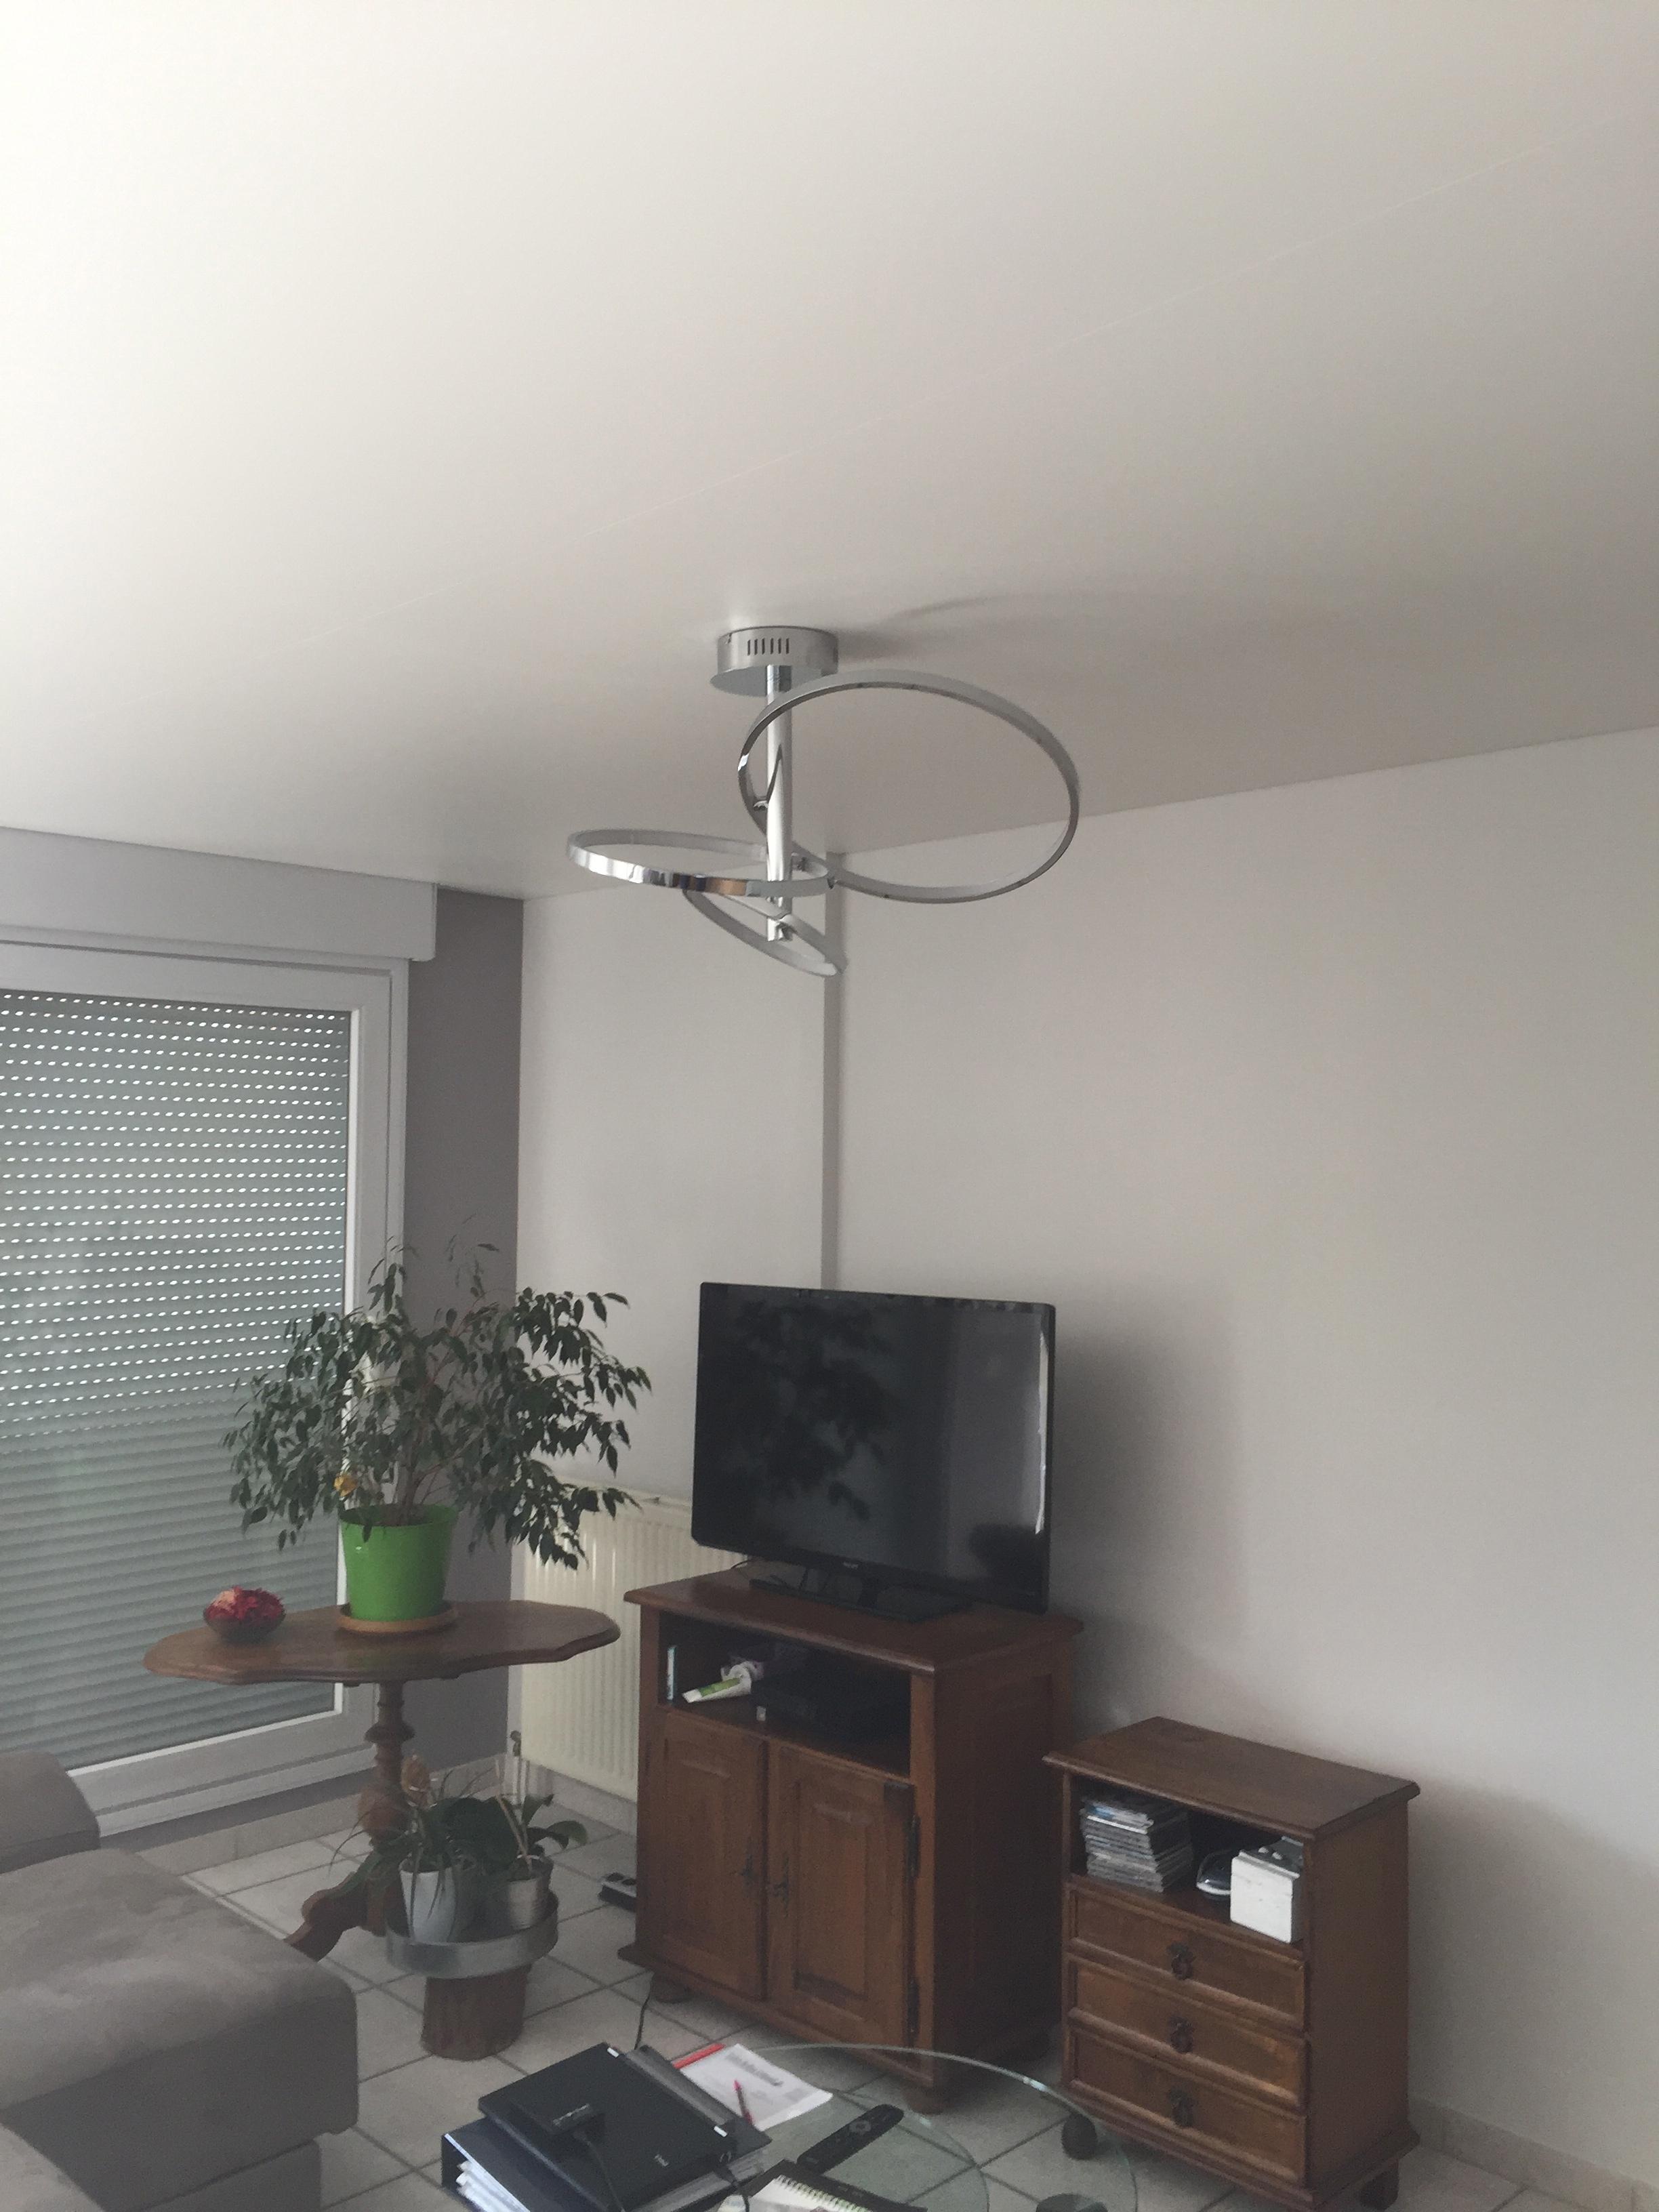 bande fissure plafond